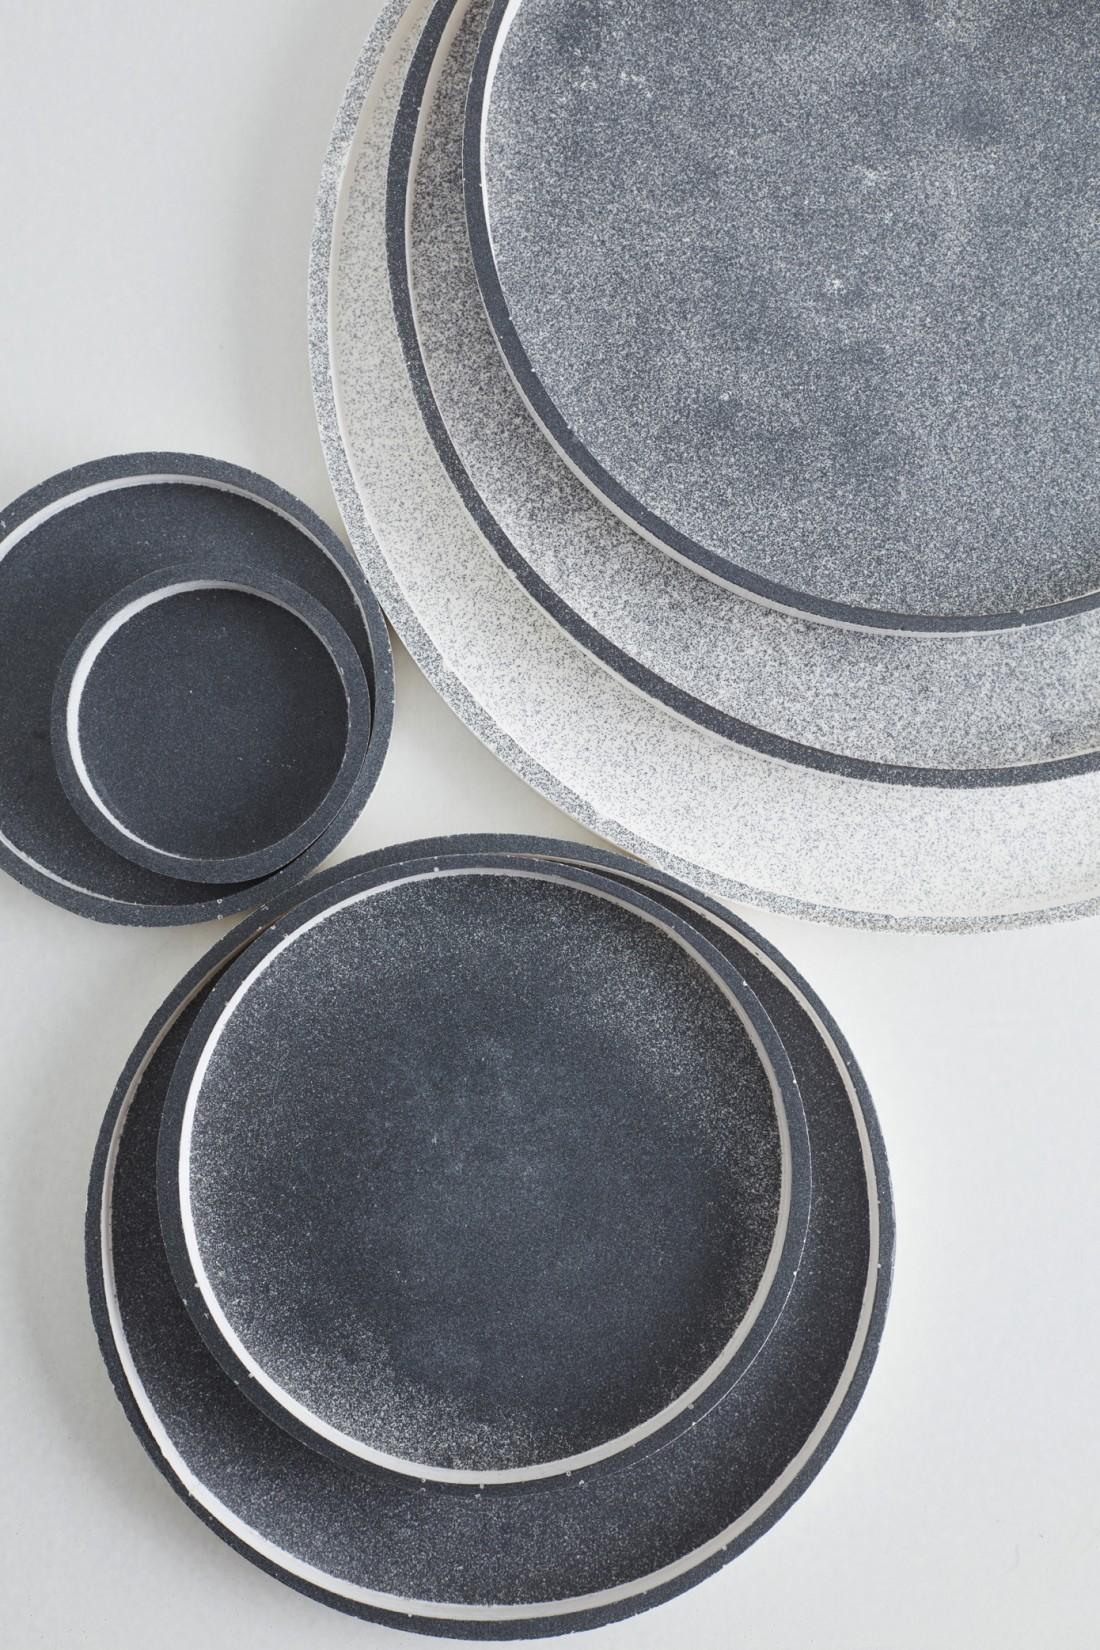 Sept epoxy grey platters